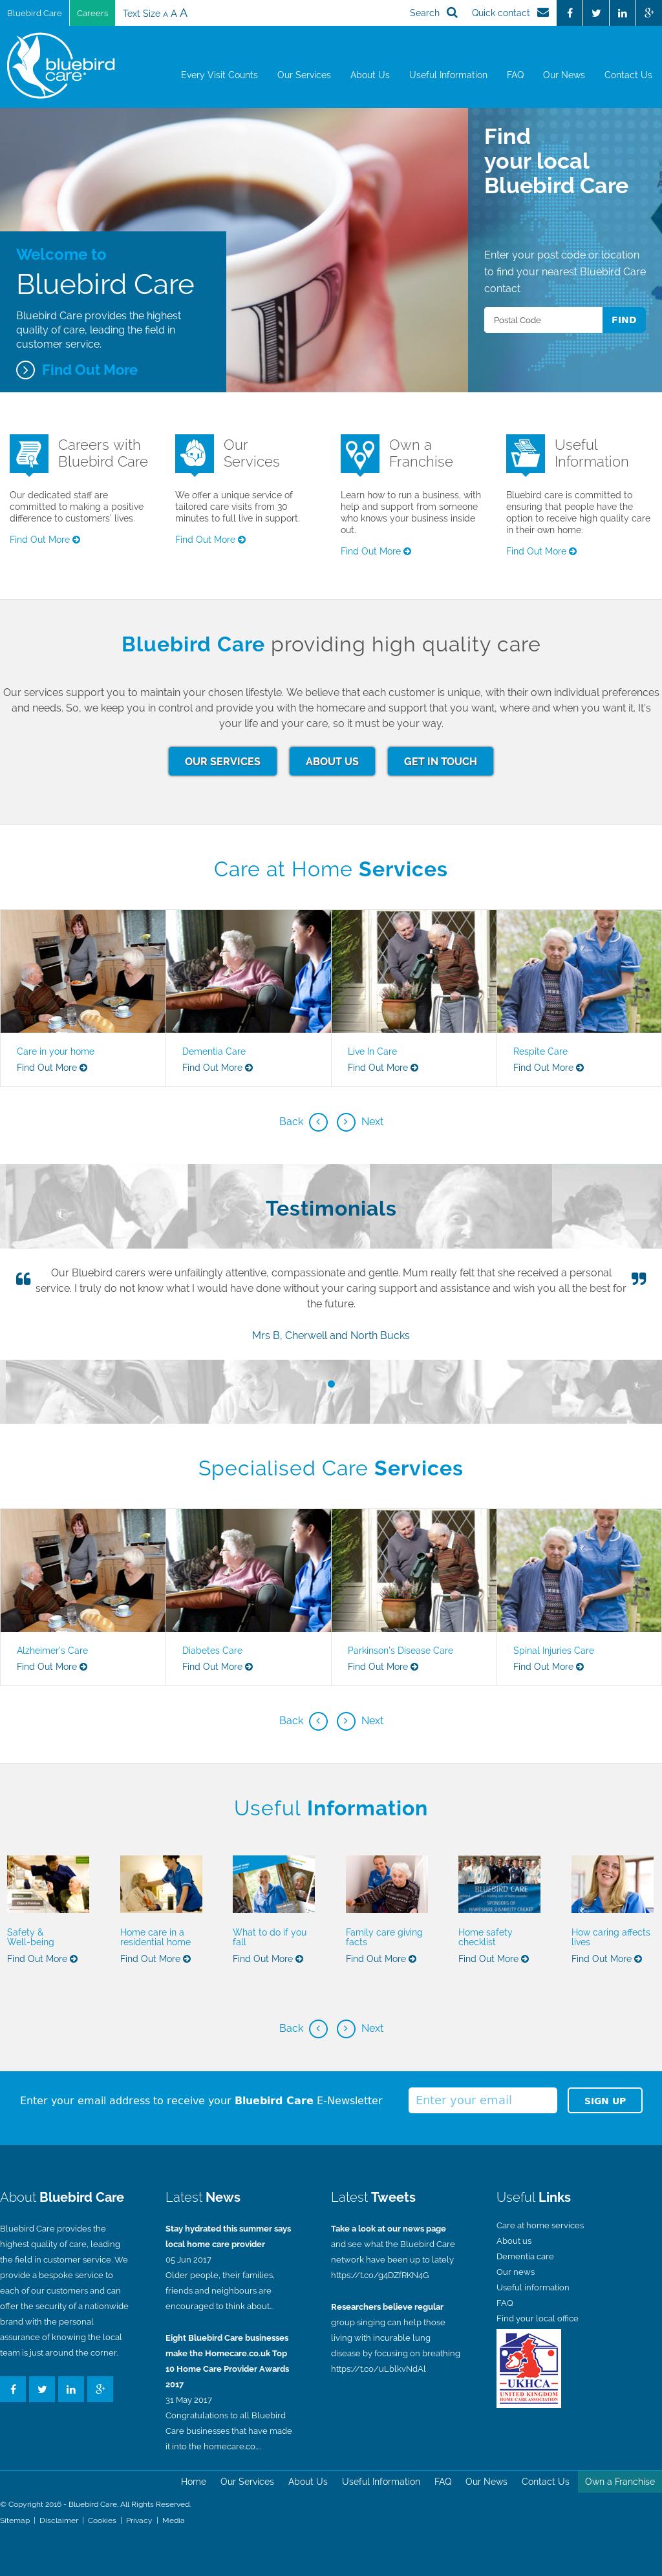 Bluebird Care Competitors, Revenue and Employees - Owler Company Profile